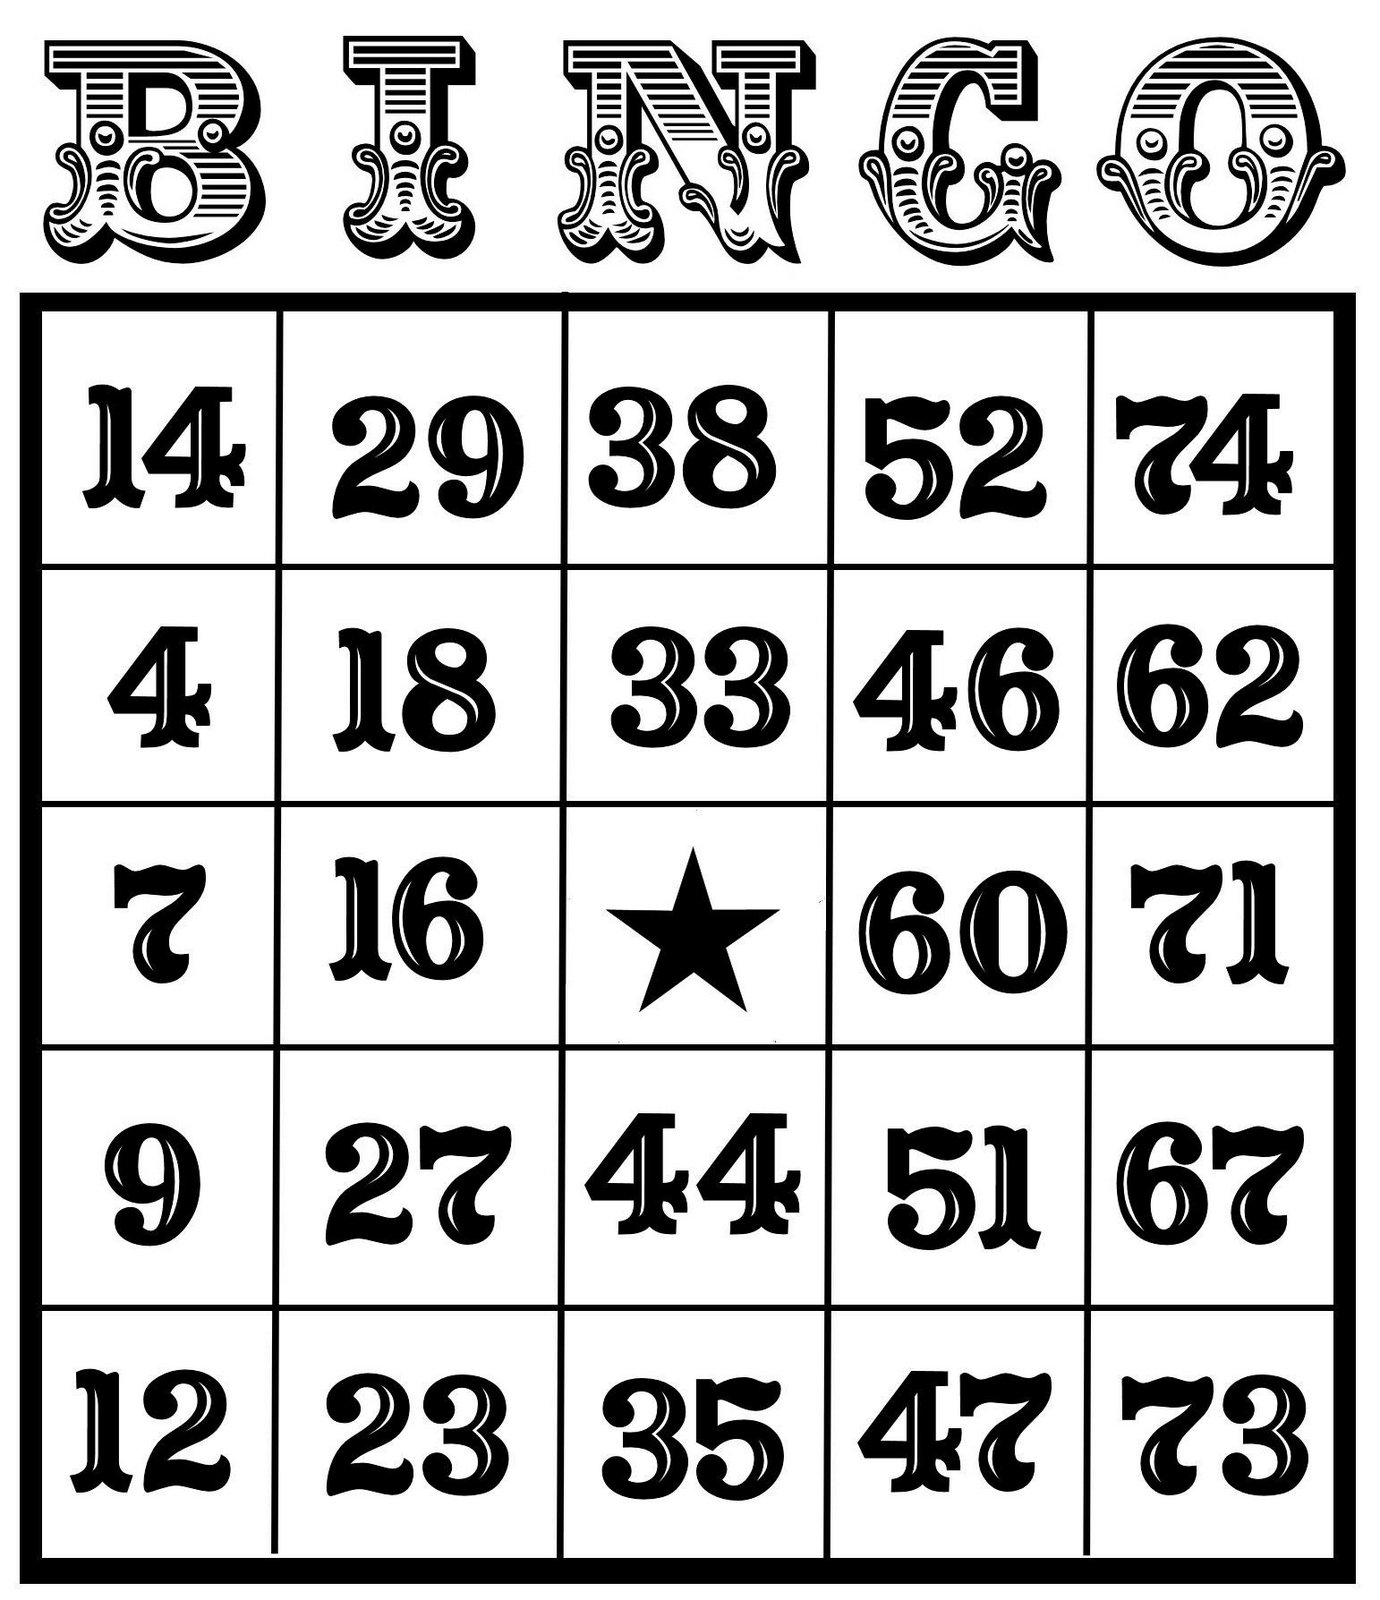 Bingo clipart bingo card. Christine zani printables to